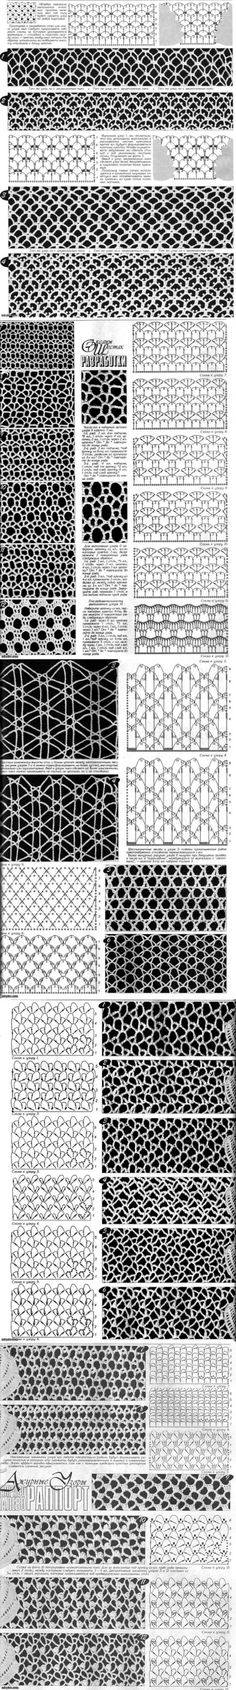 Сетка крючком | Ирландское кружево. | Постила.    Crochet stitch patterns